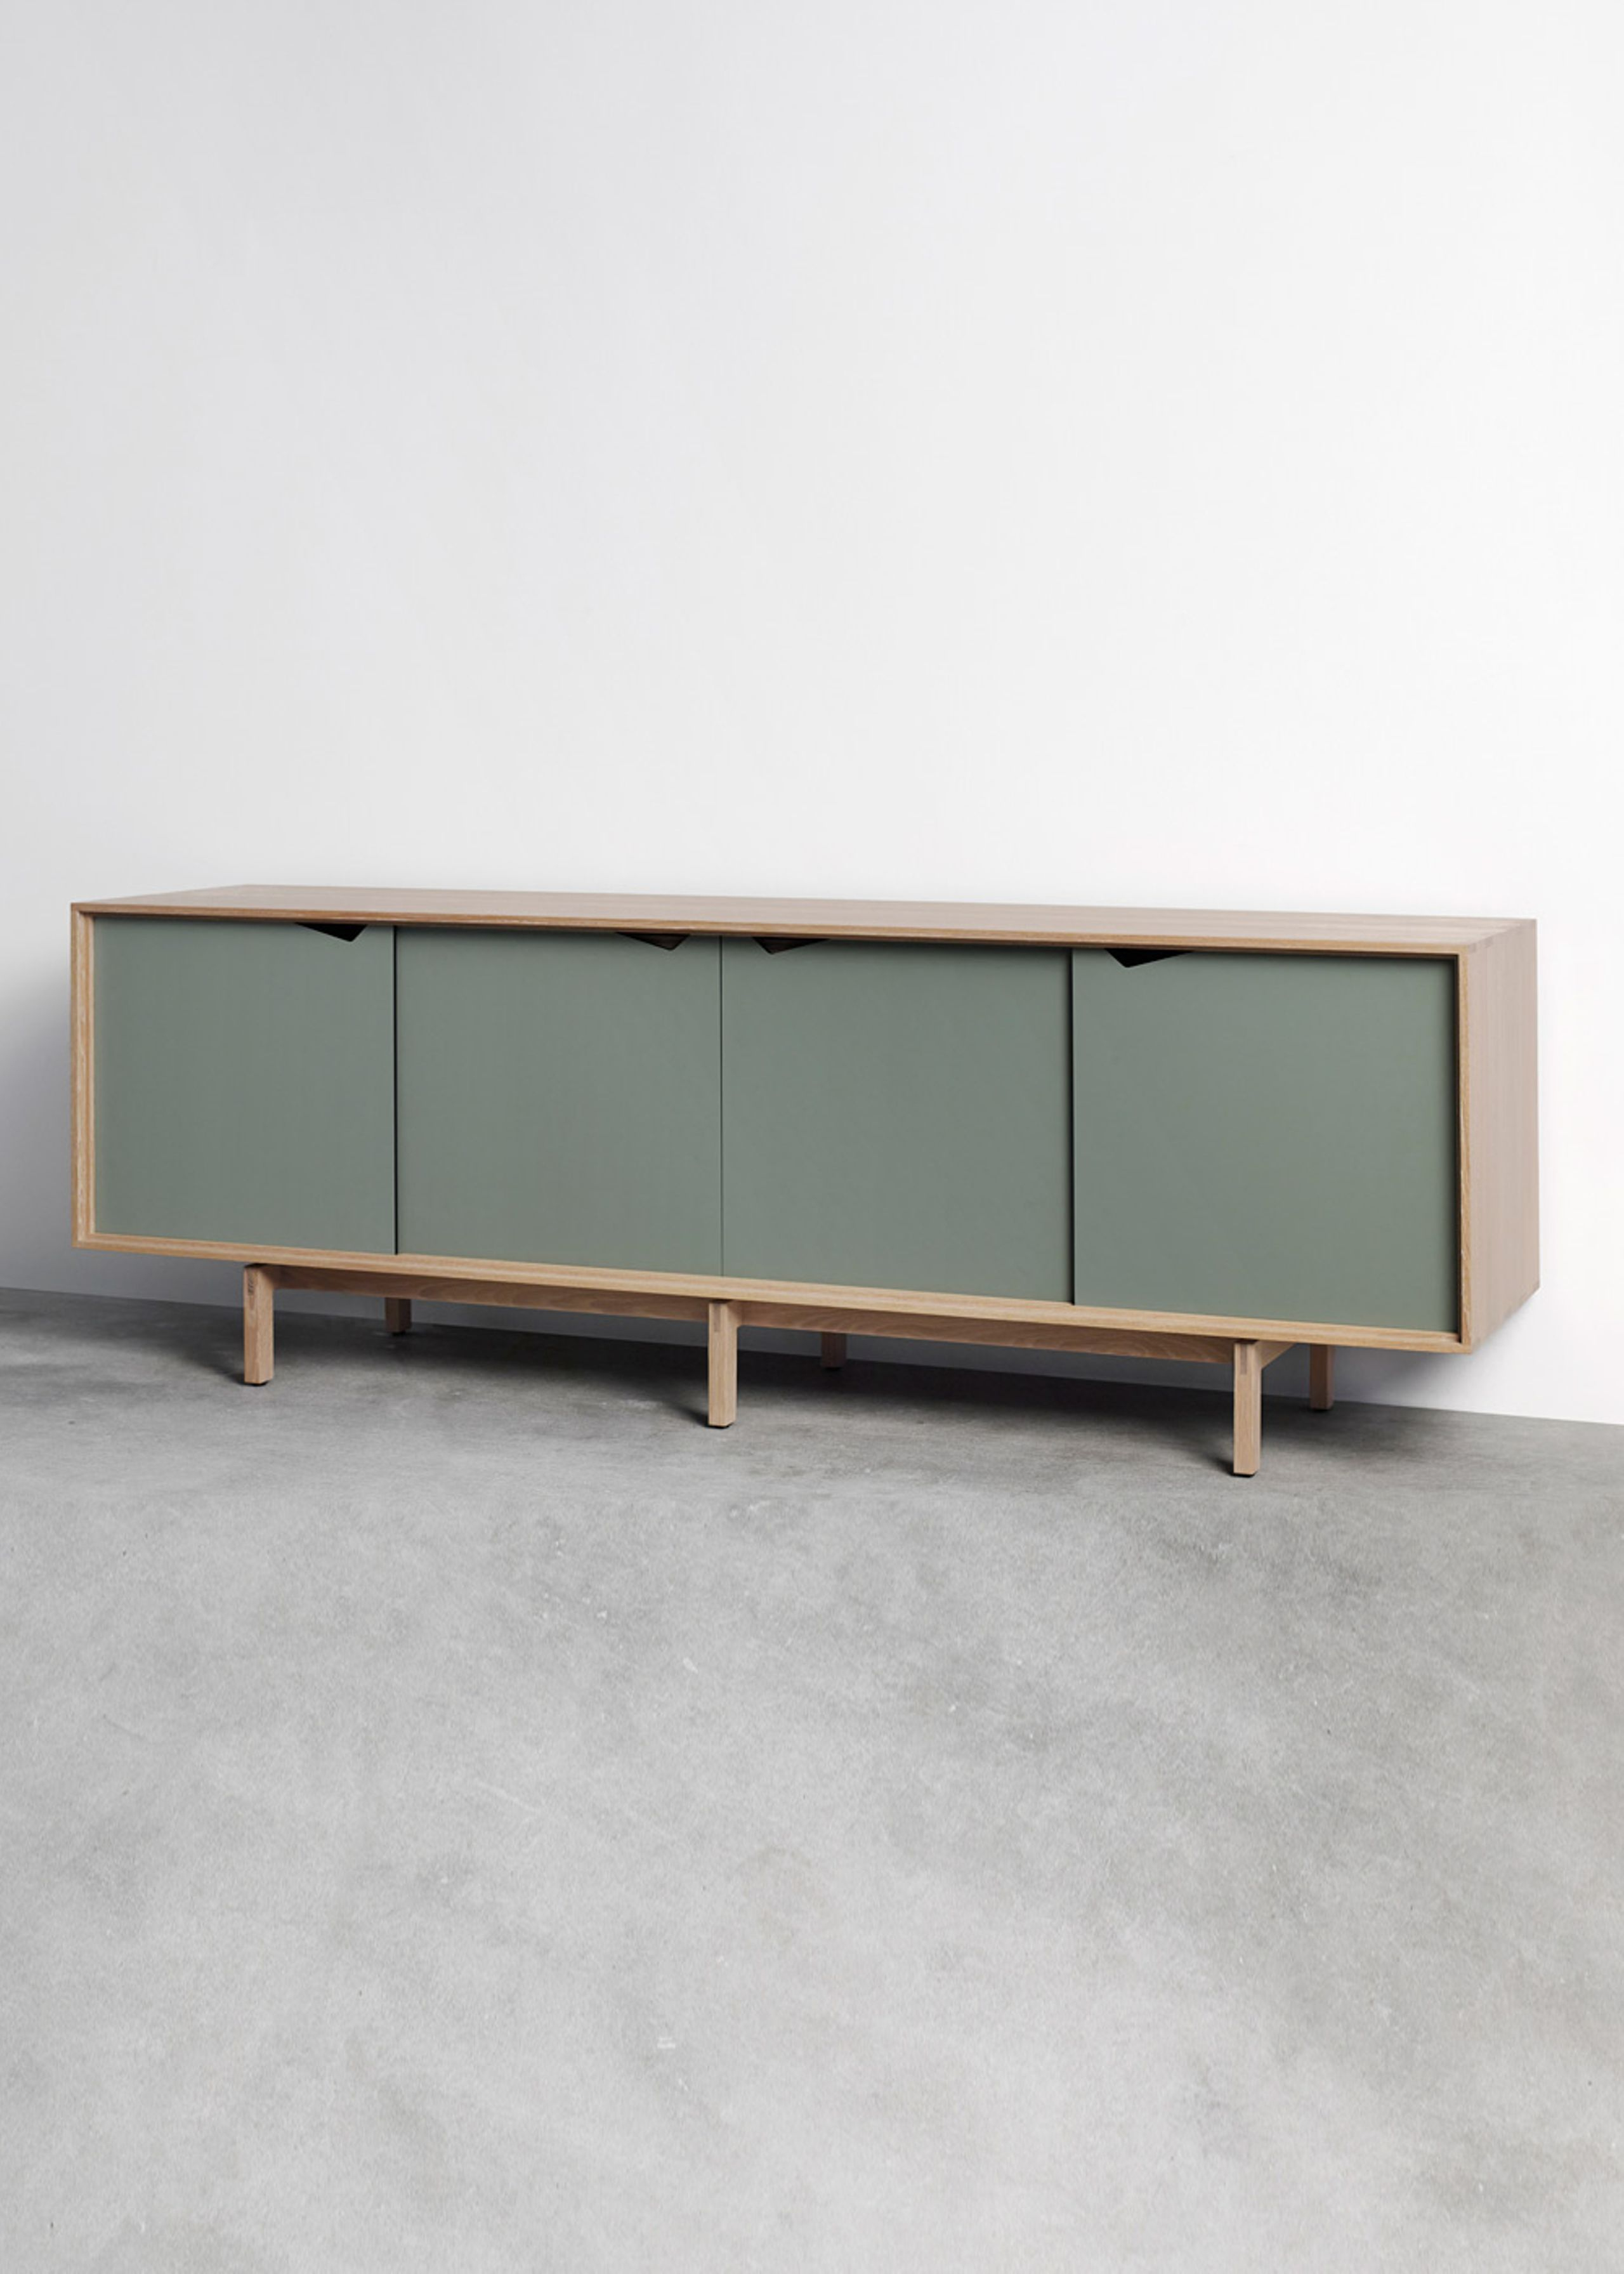 ... Andersen Furniture   Sideboard   S1 Sideboard   Oak / Nature Oil ...